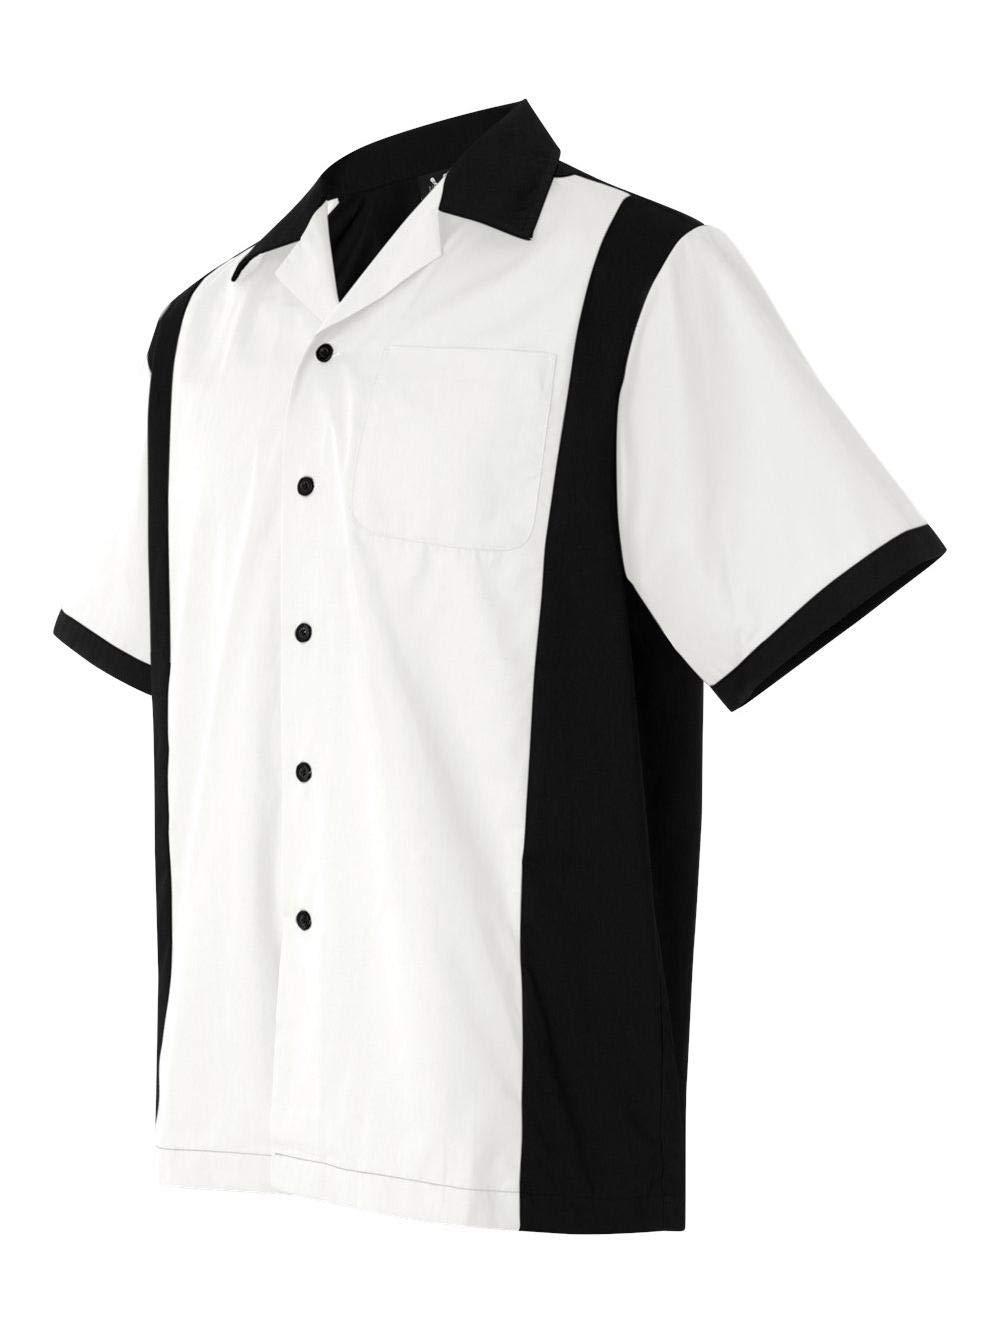 Hilton HP2243 - Cruiser Bowling Shirt White by Hilton